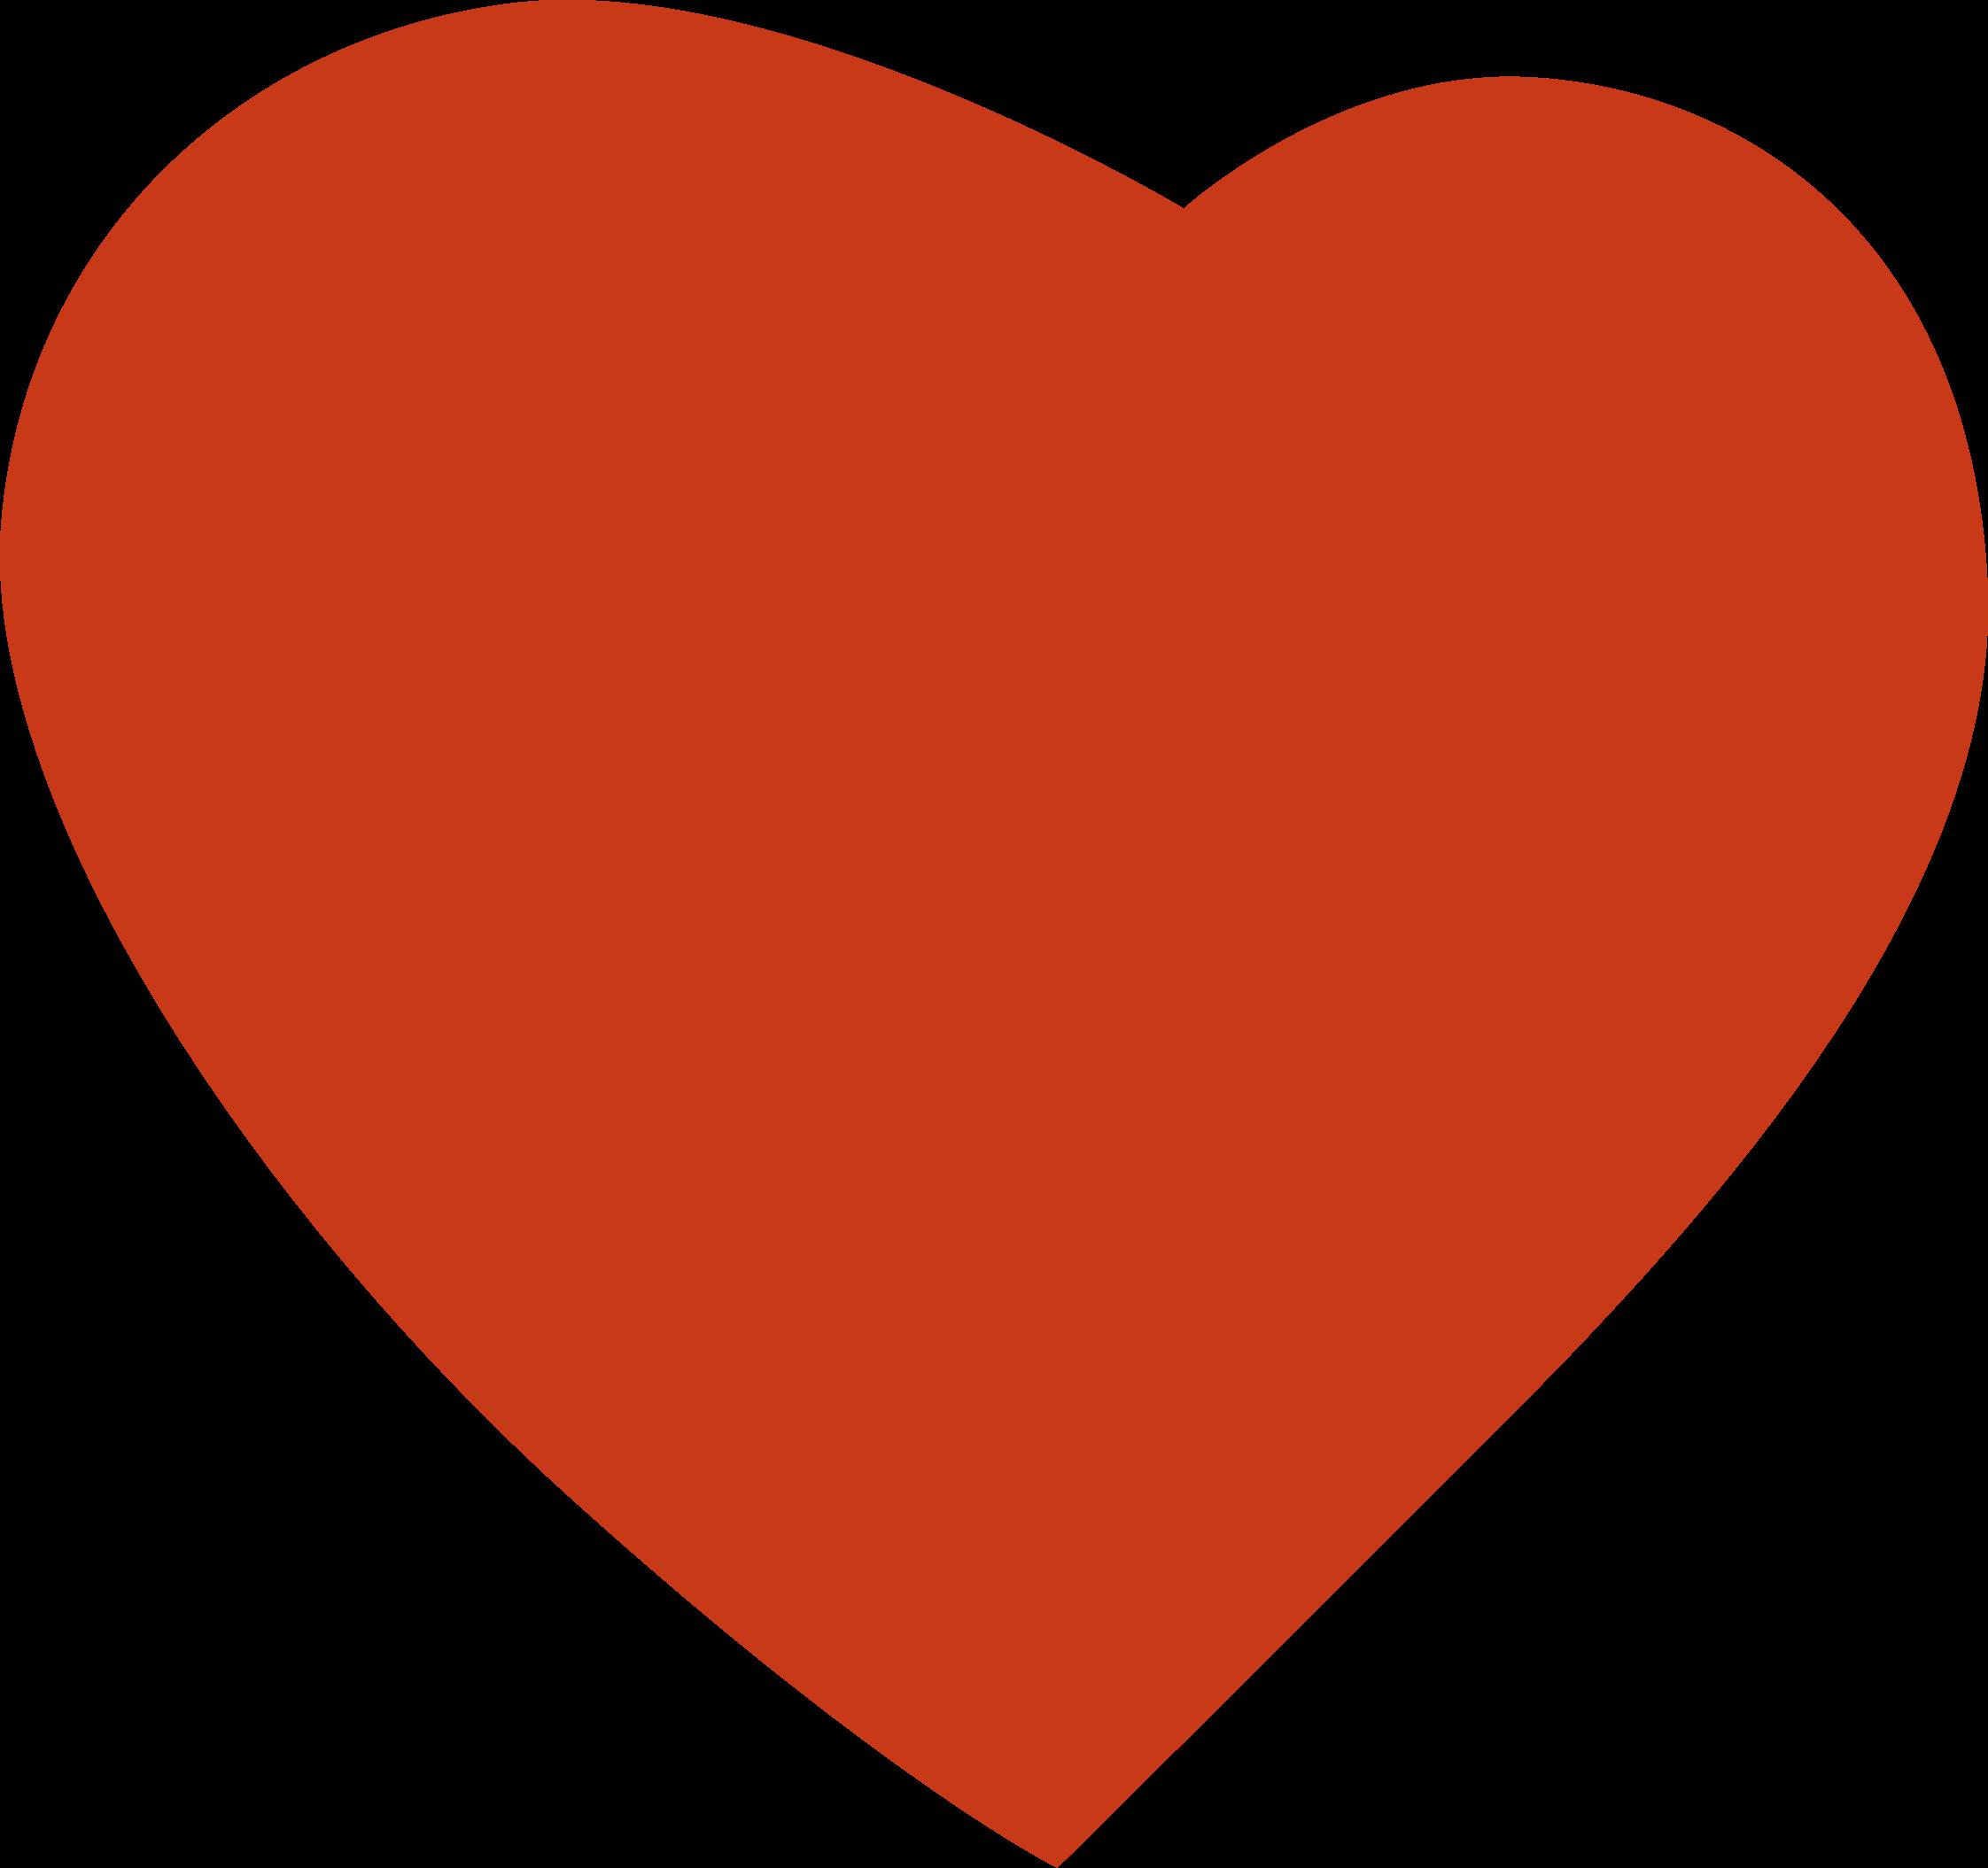 Cuore big image png. Clipart heart orange